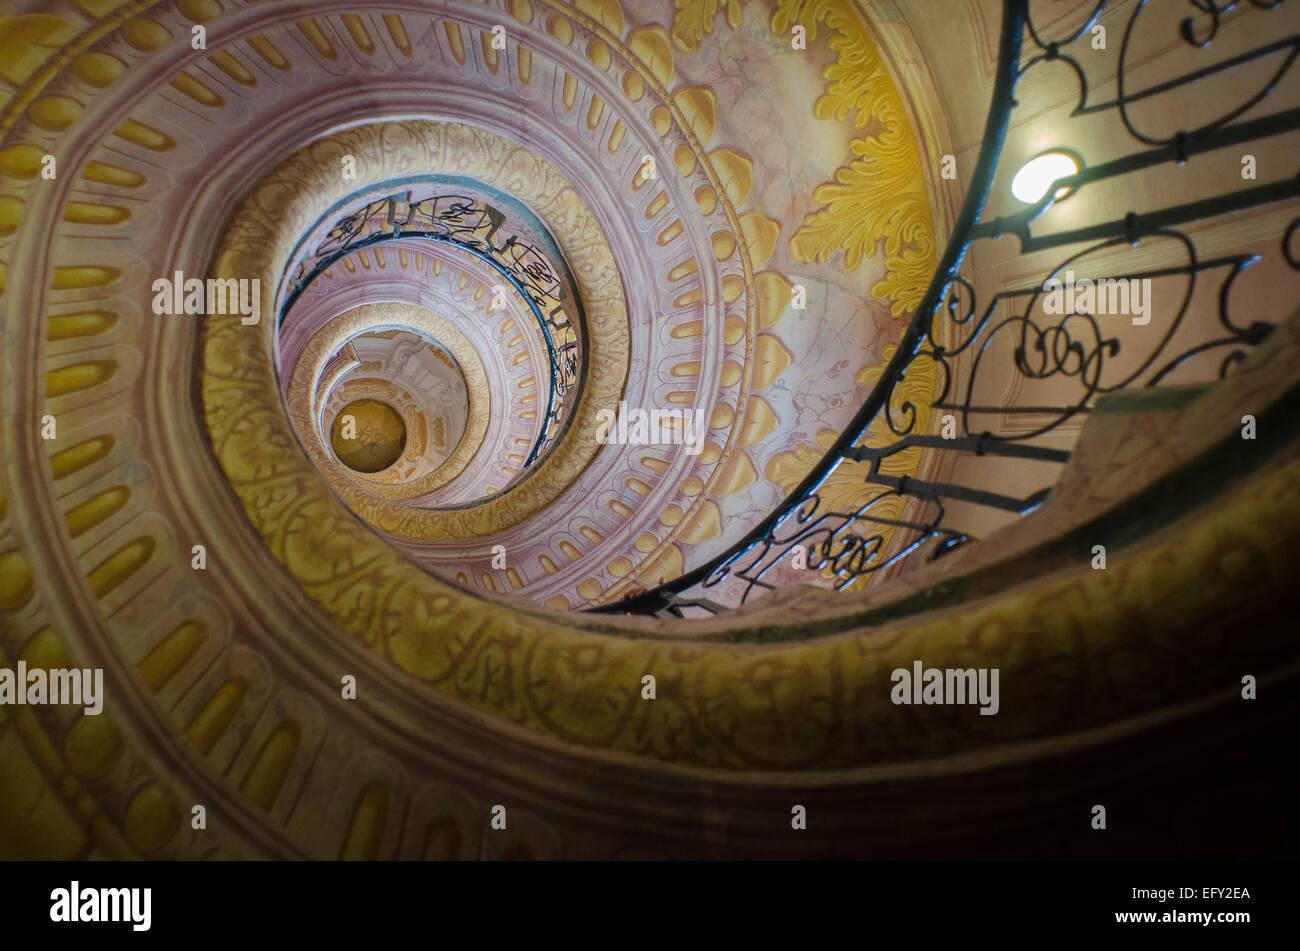 L'Autriche Abbaye Bénédictine Abbaye de Melk est renommée pour son escalier en spirale vertigineuse. Photo Stock